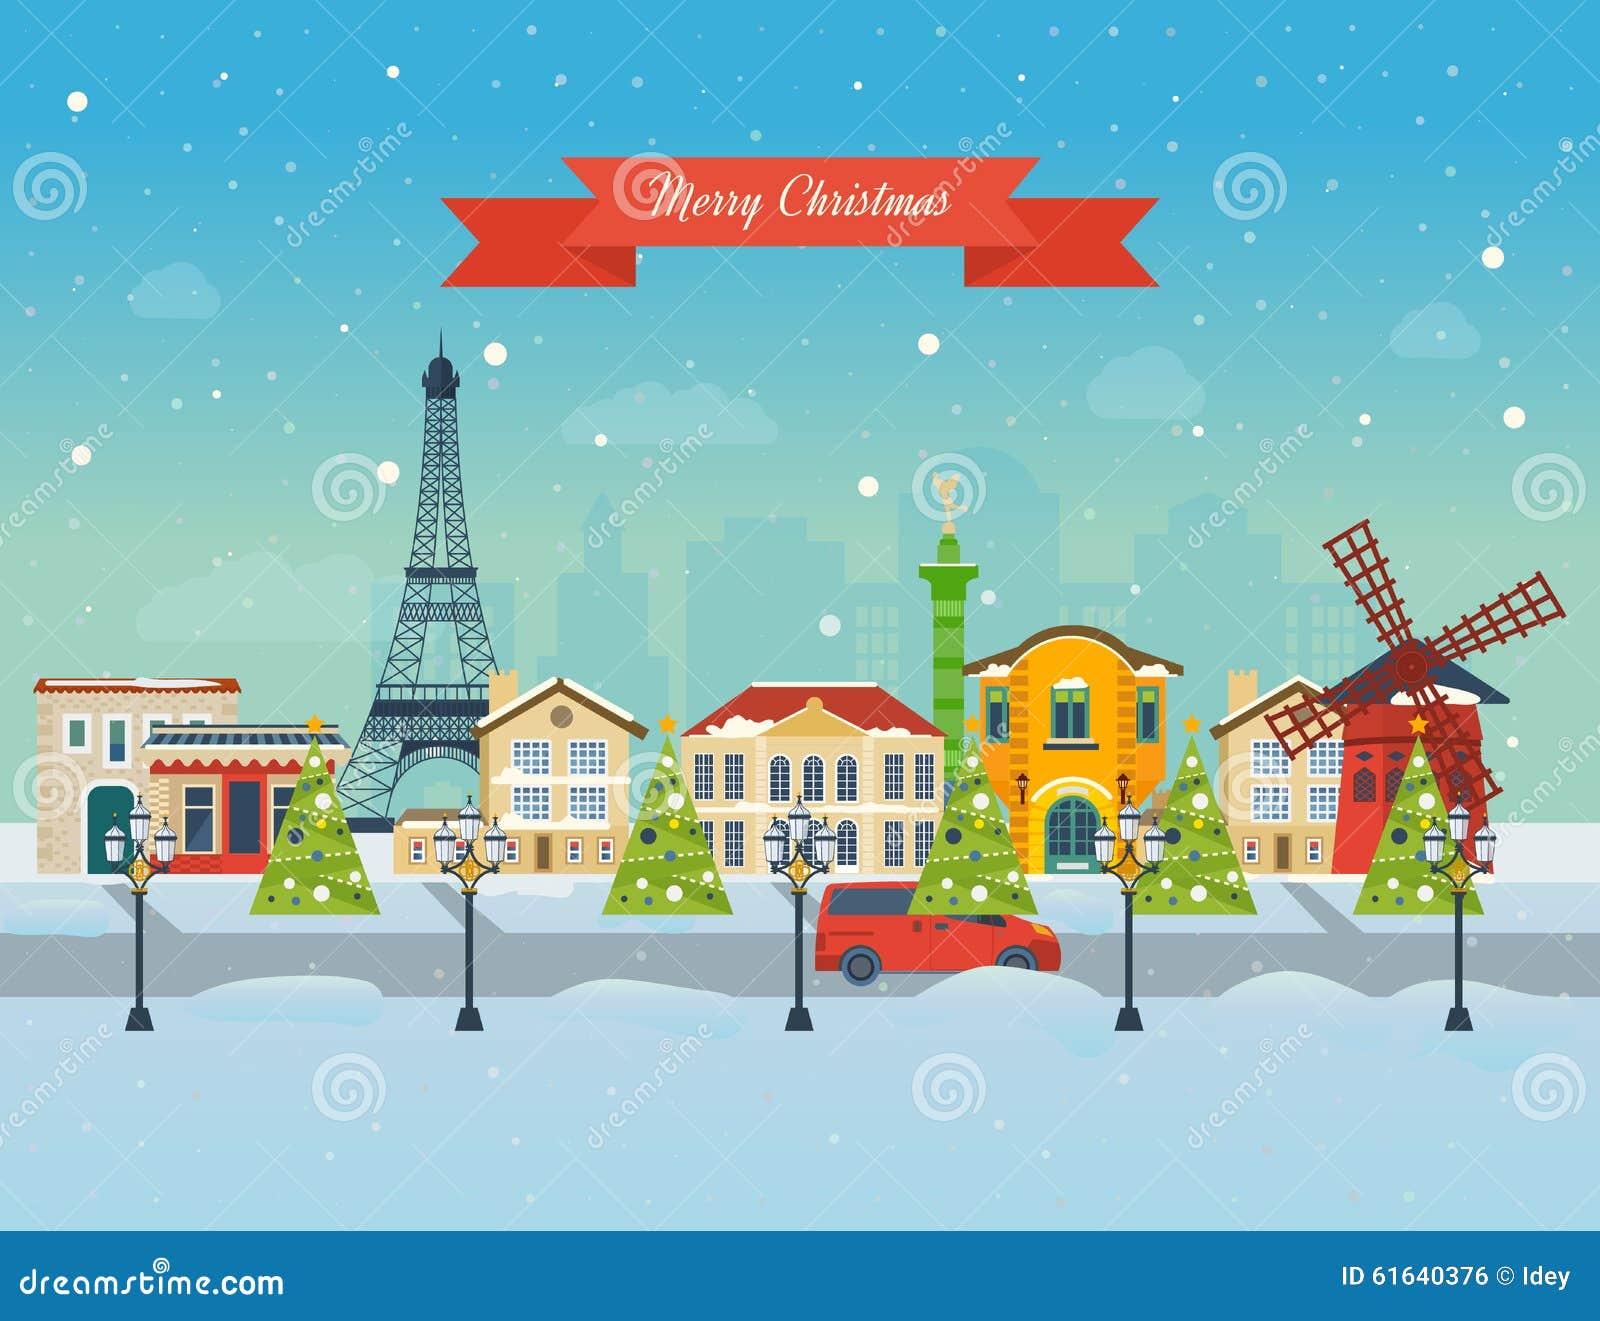 Merry Christmas Greeting Card Design. Paris Stock Vector